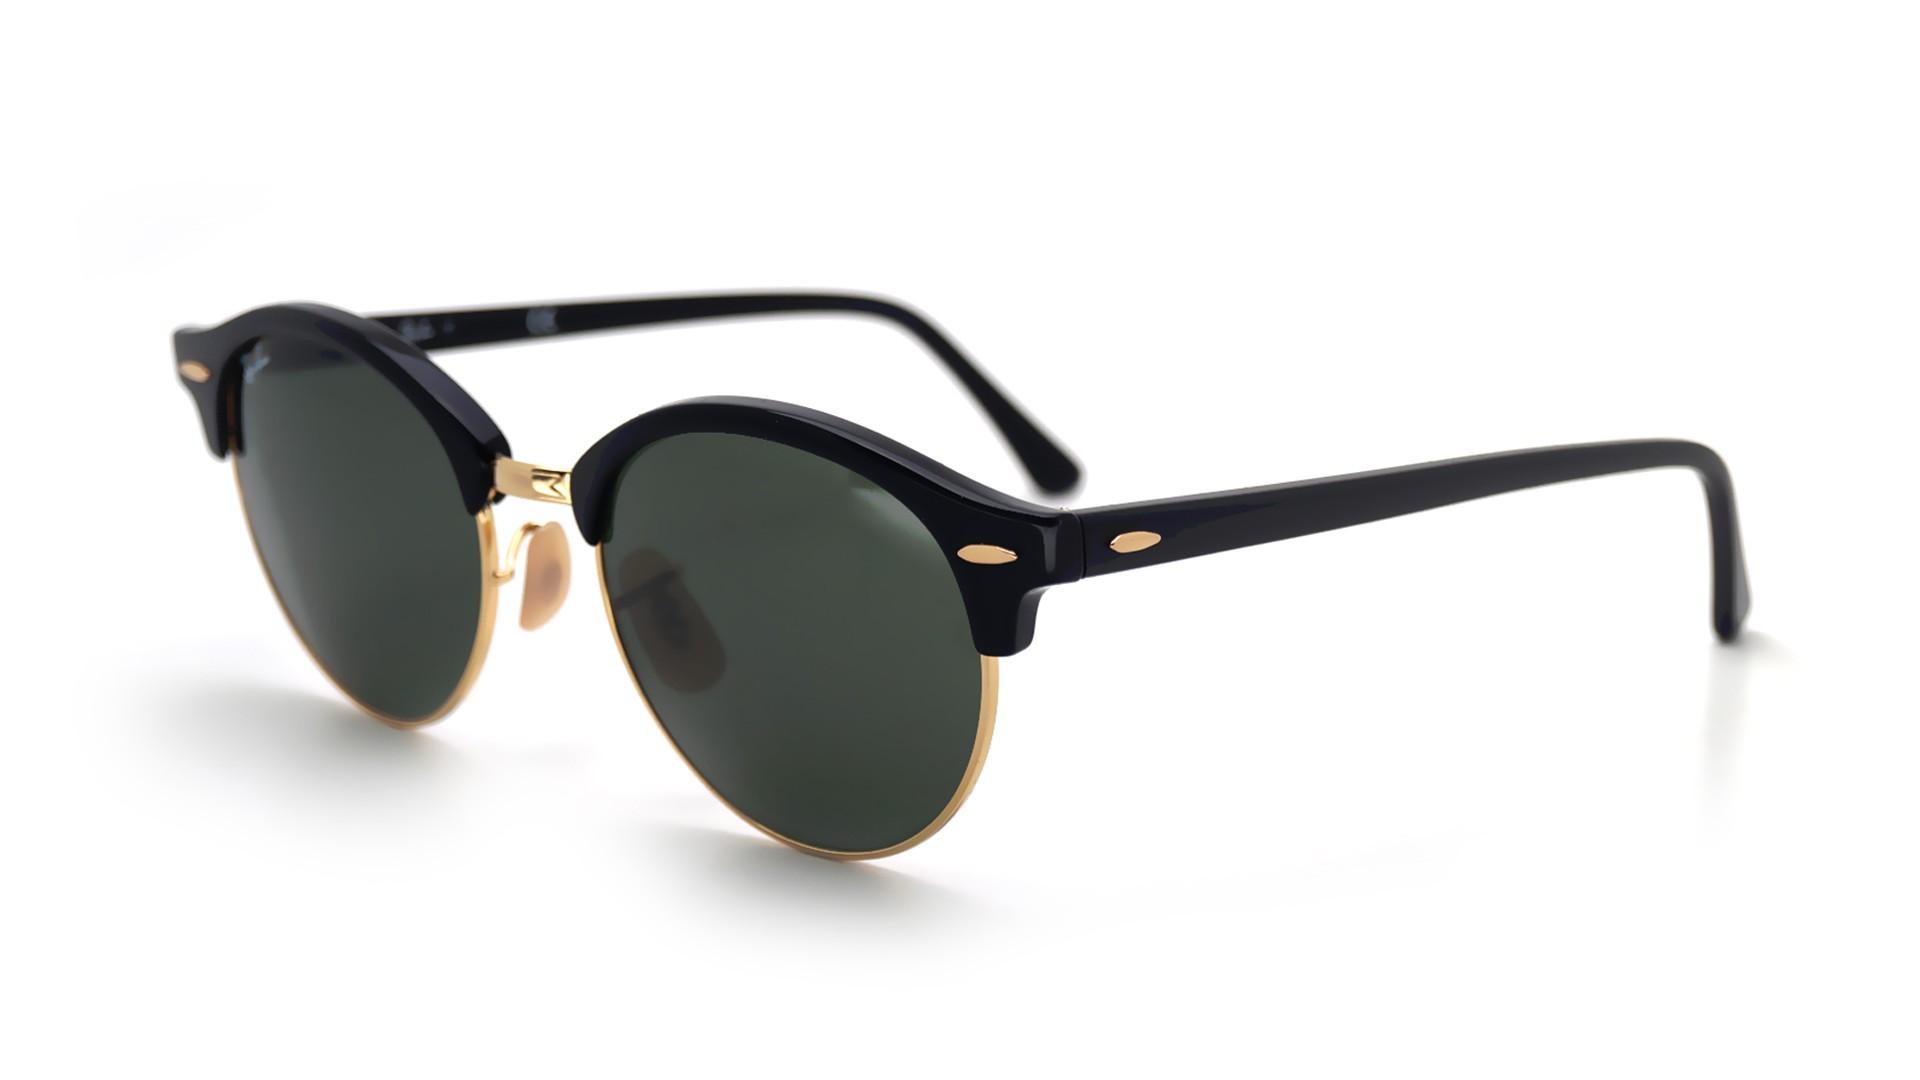 Sunglasses Ray-Ban Clubround Black G15 RB4246 901 51-19 Medium 43862b768063